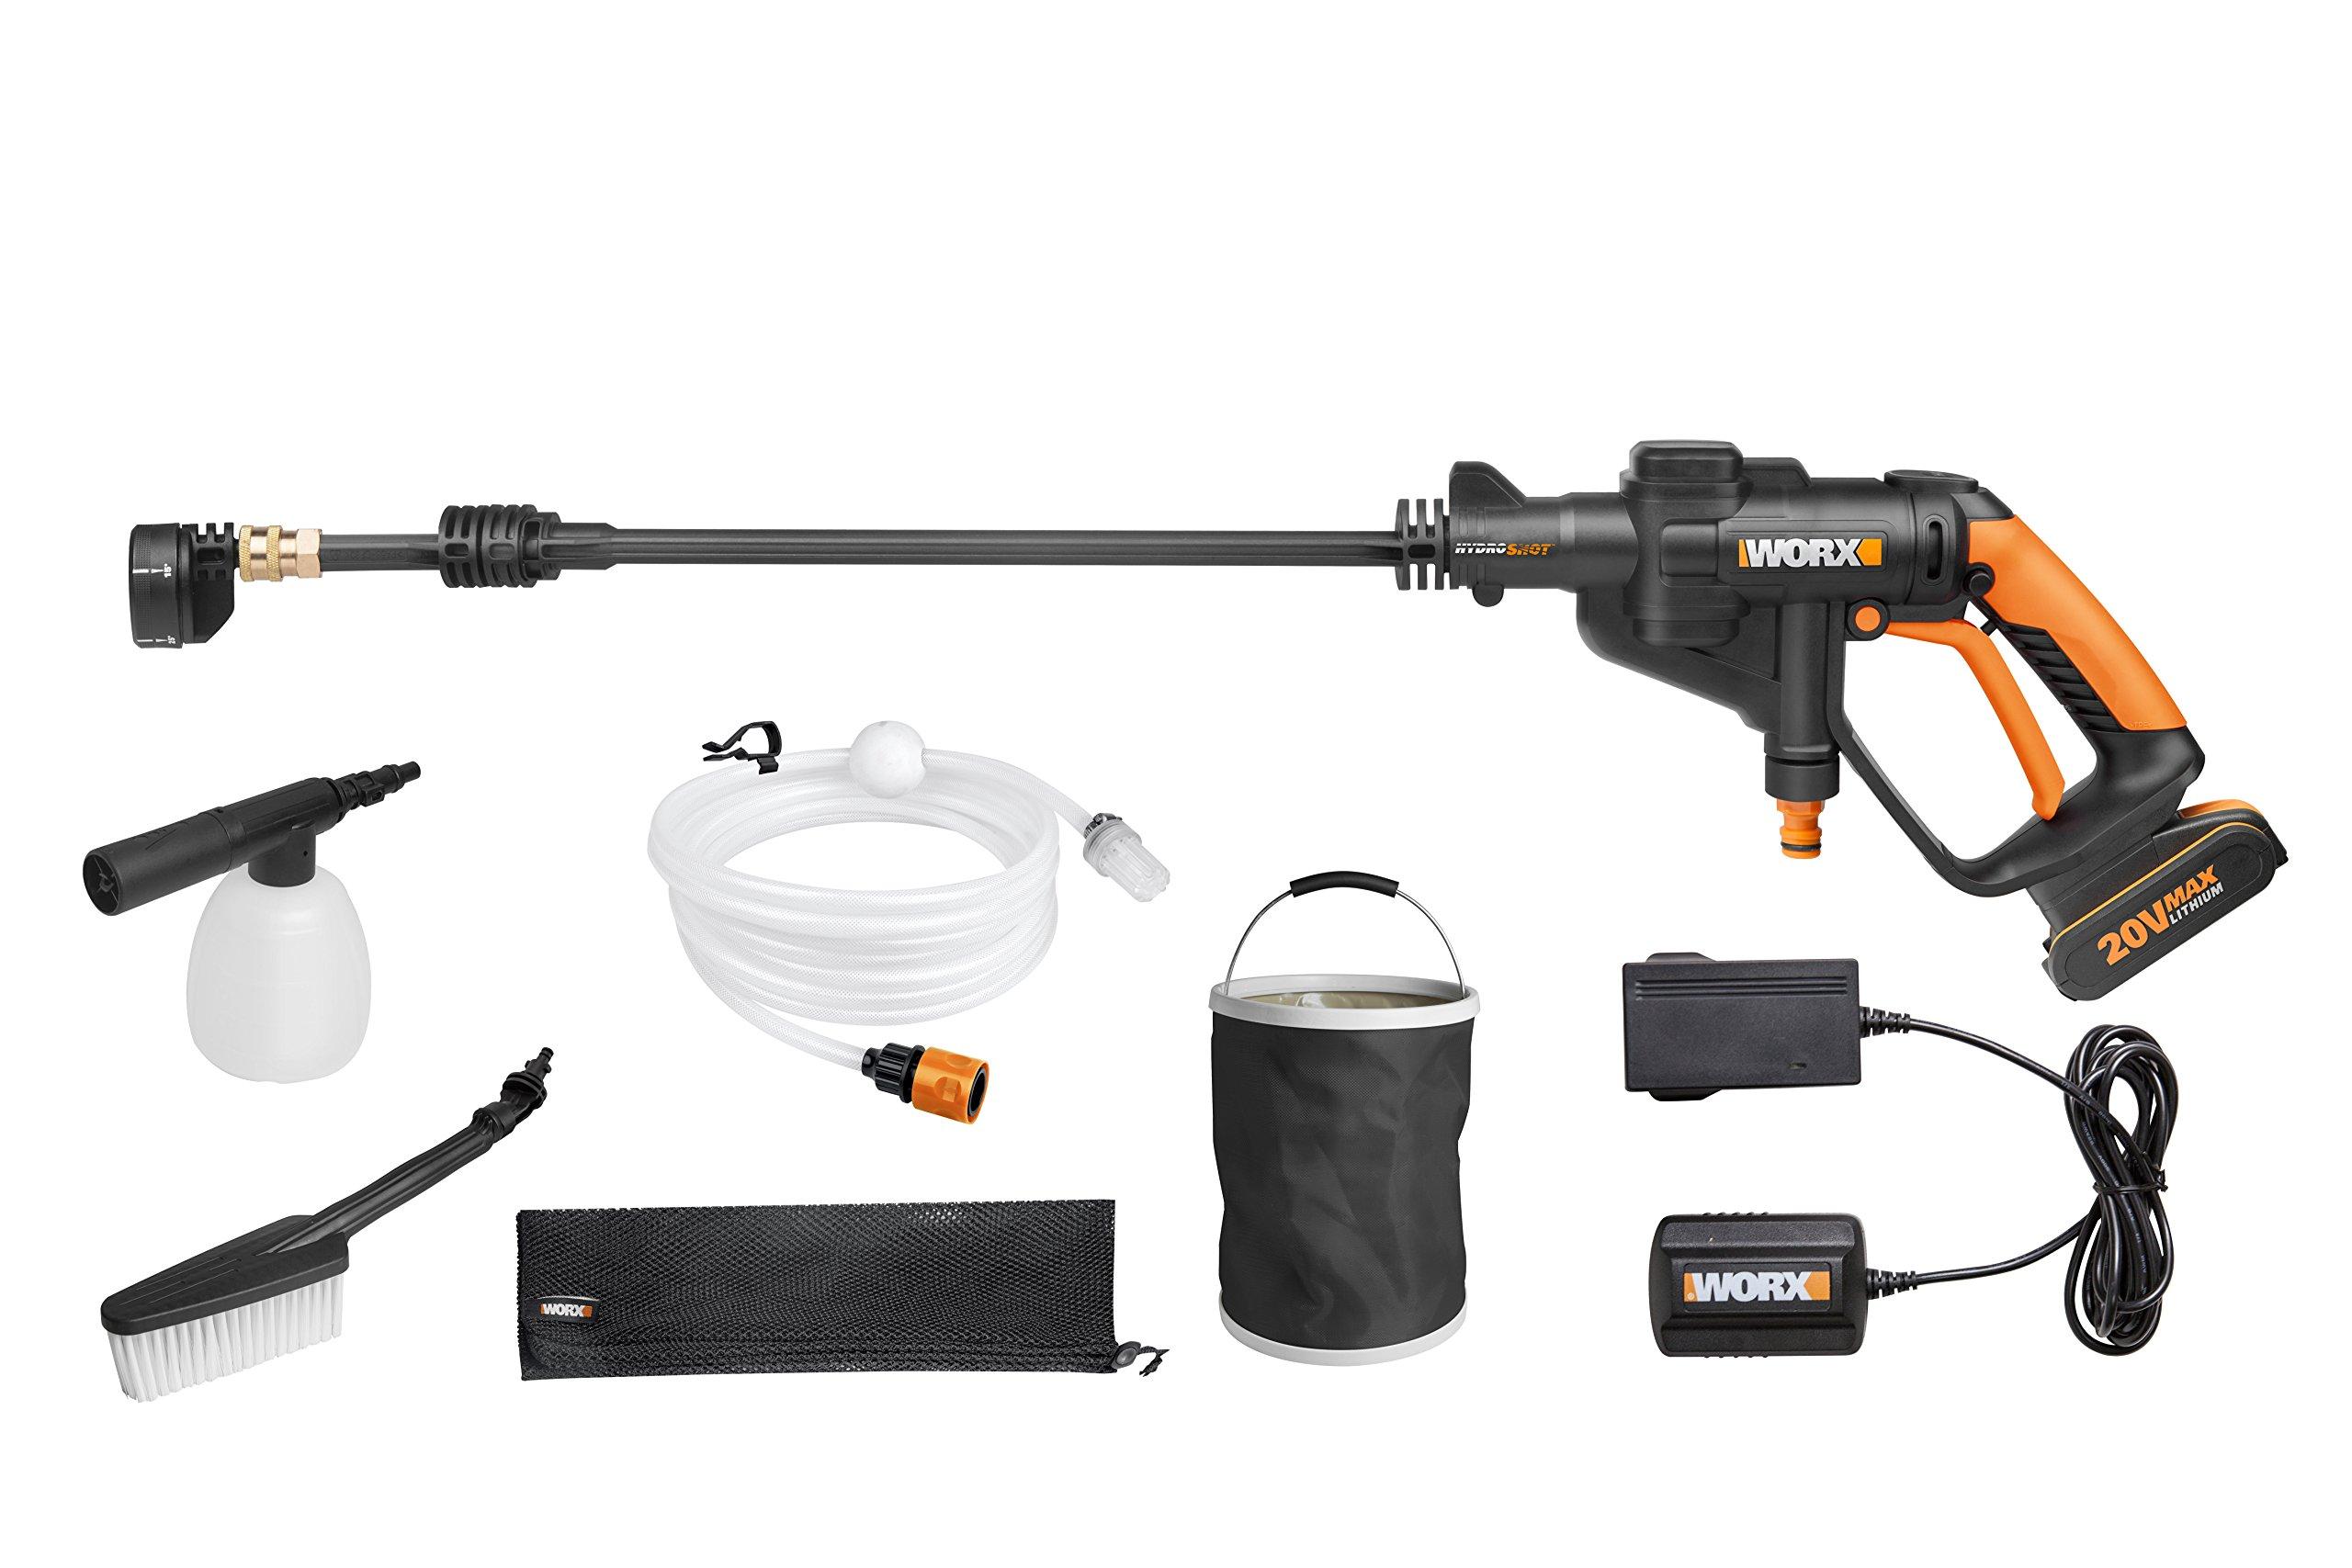 worx wg629e 1 hydroshot portable battery pressure cleaner. Black Bedroom Furniture Sets. Home Design Ideas